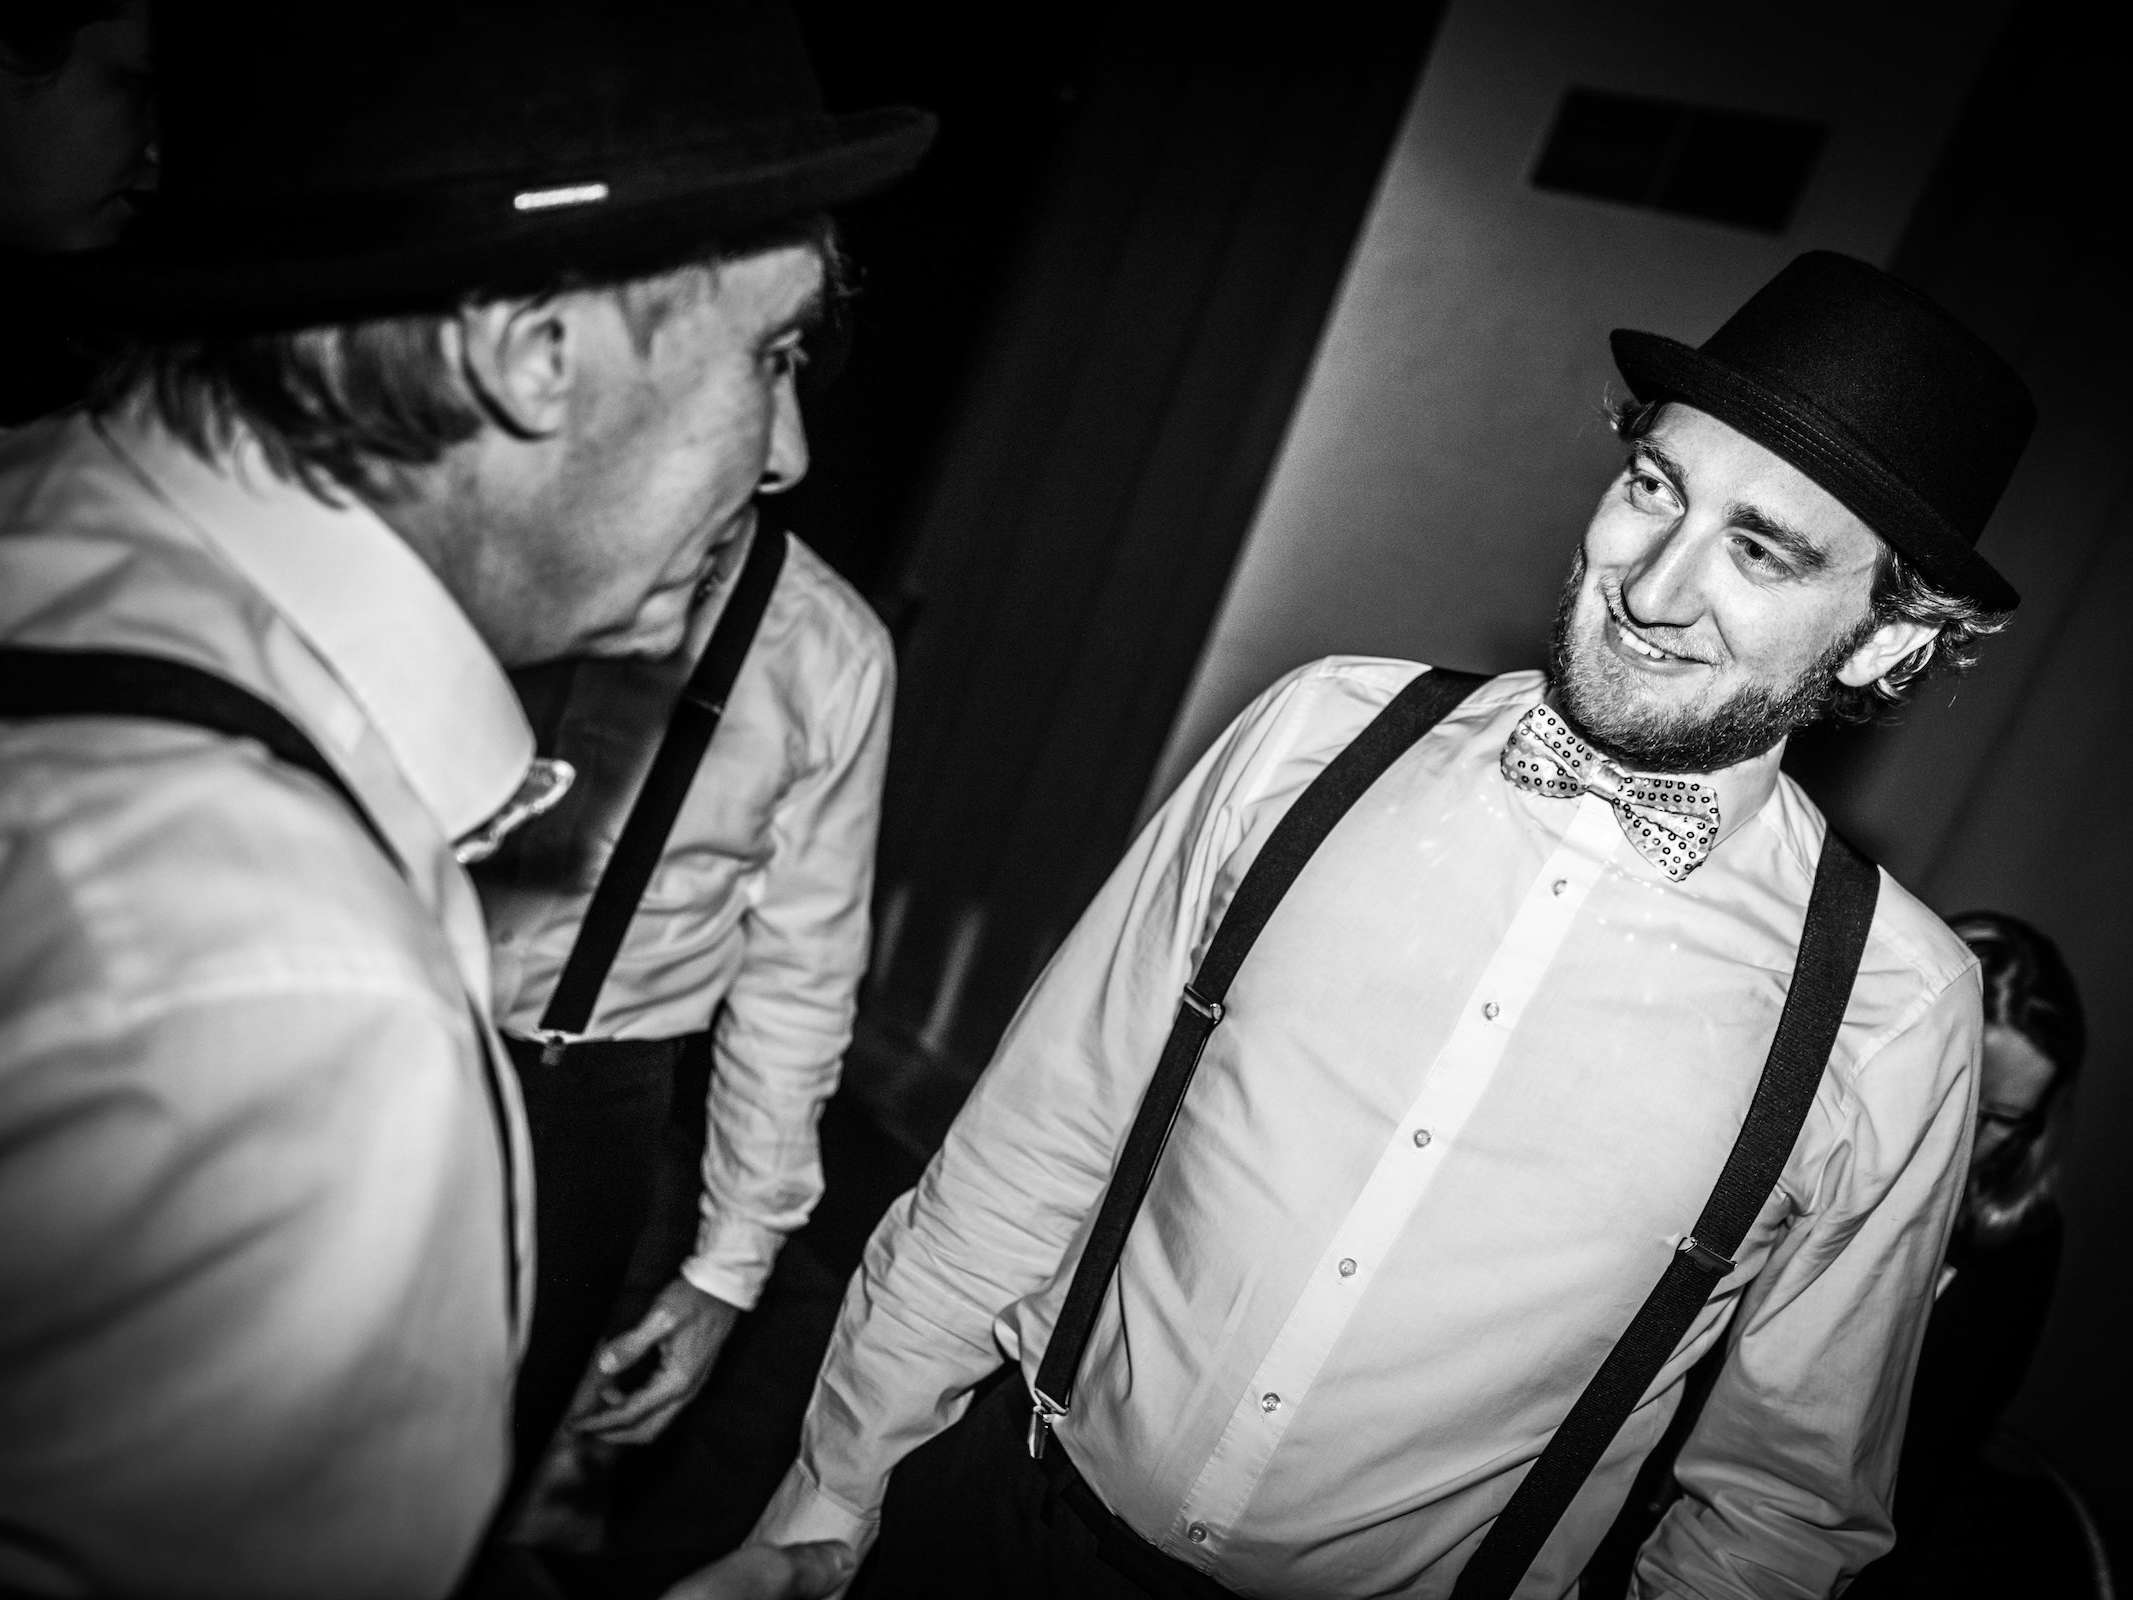 Band | Hannover | Liveband | Partyband | Jazzband |Swingband |Loungeband | Popband |Jazz | Motwon | Absprache | Kundentermin | Hochzeit | Messe | Firmenfeier | Charity | Gala | Buchen | Mieten |Anfragen | Modern-Jukes